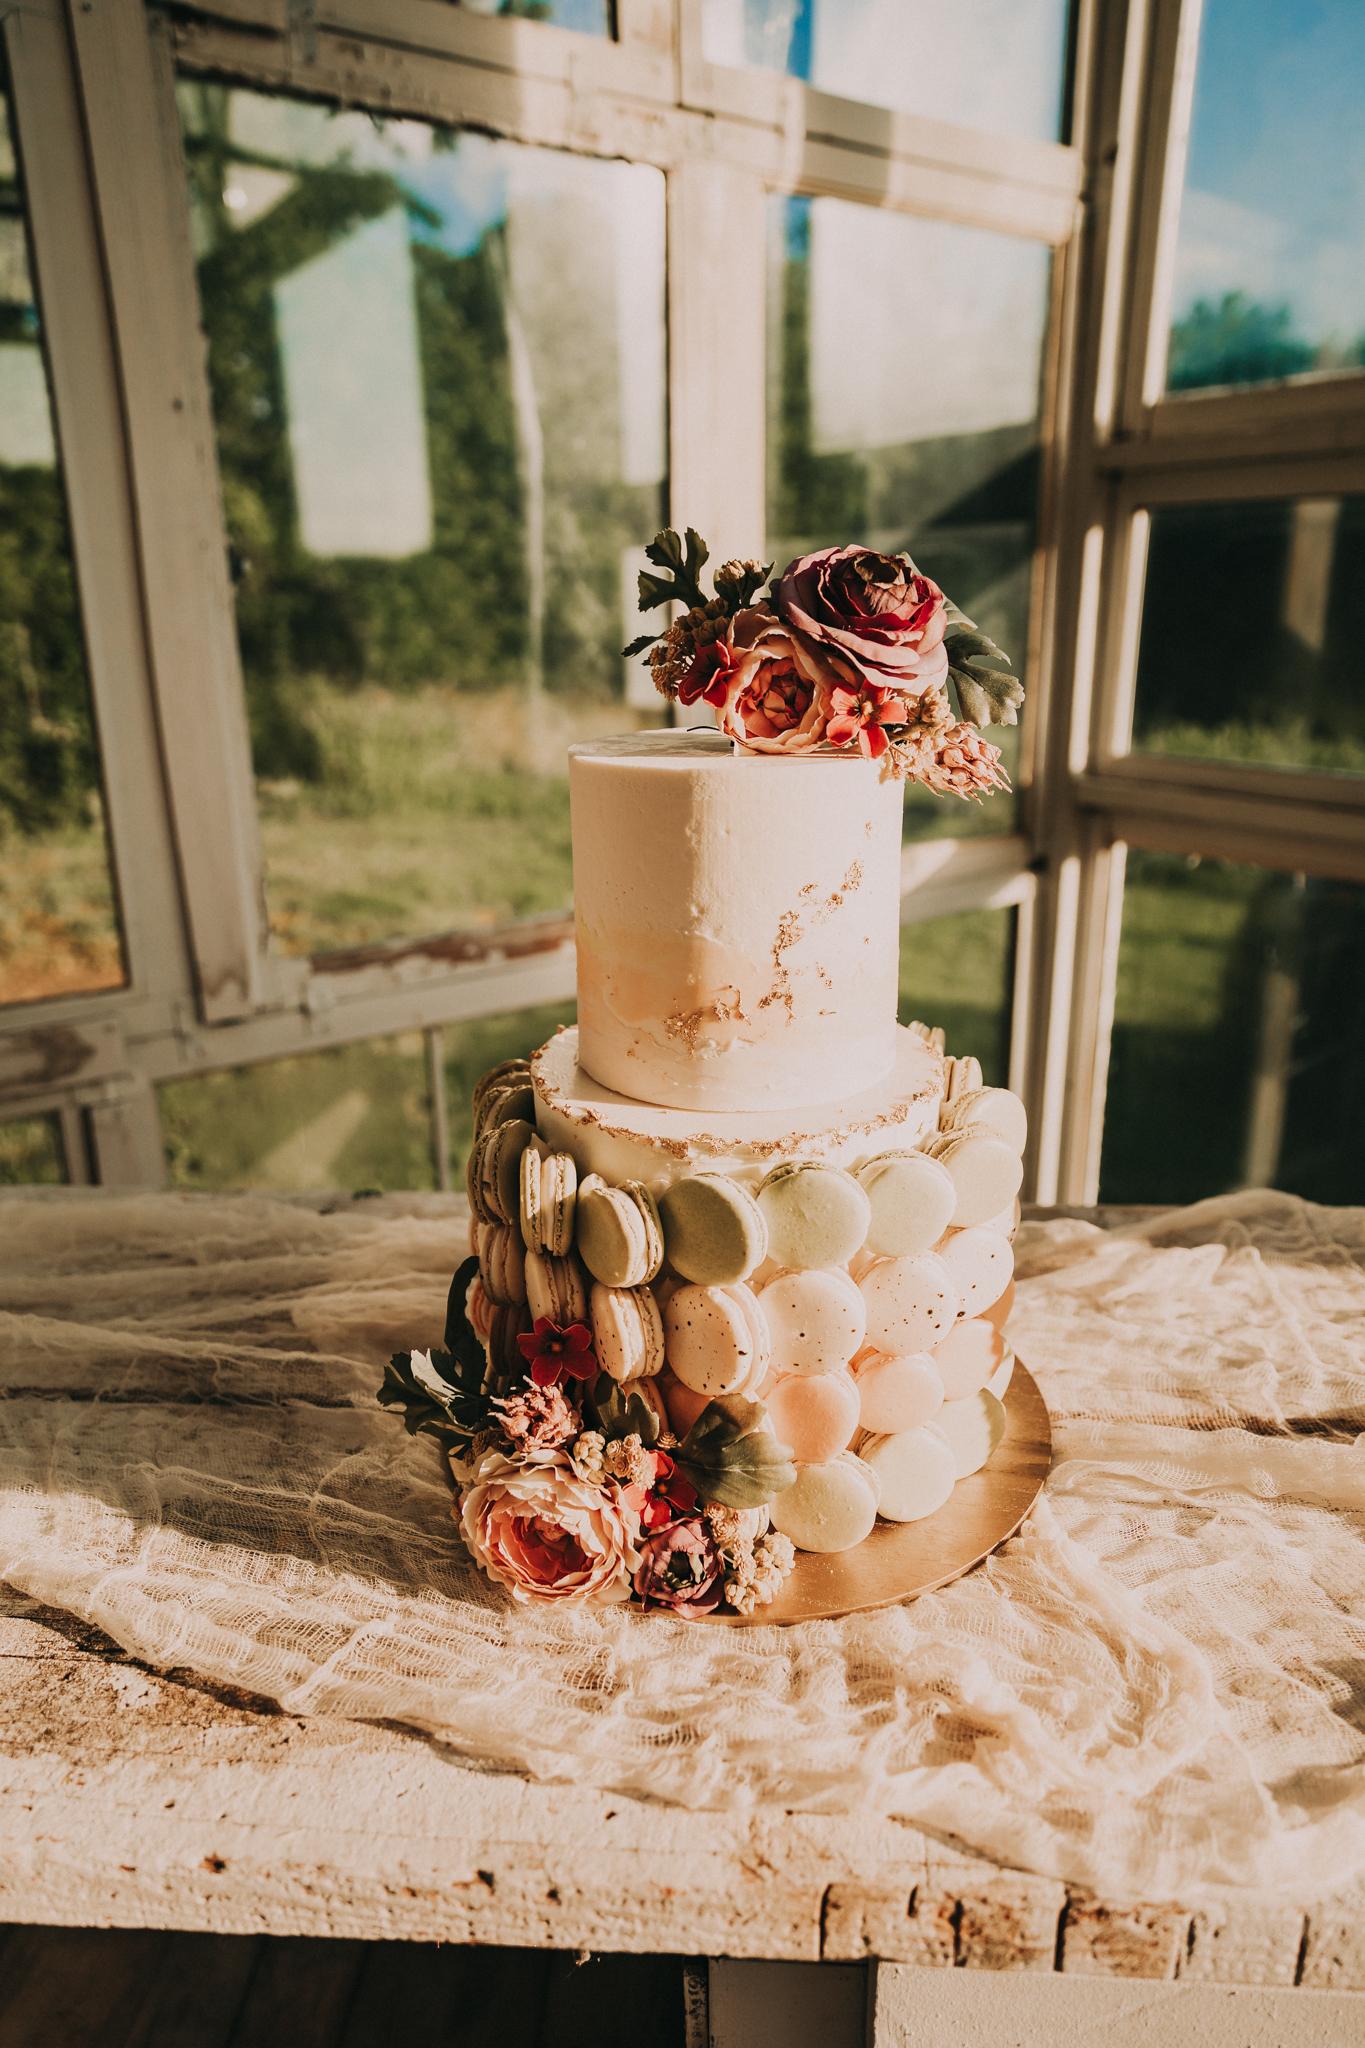 Modern wedding cake design: Flower Farm Styled Shoot by Billie-Shaye Style featured on Nashville Bride Guide